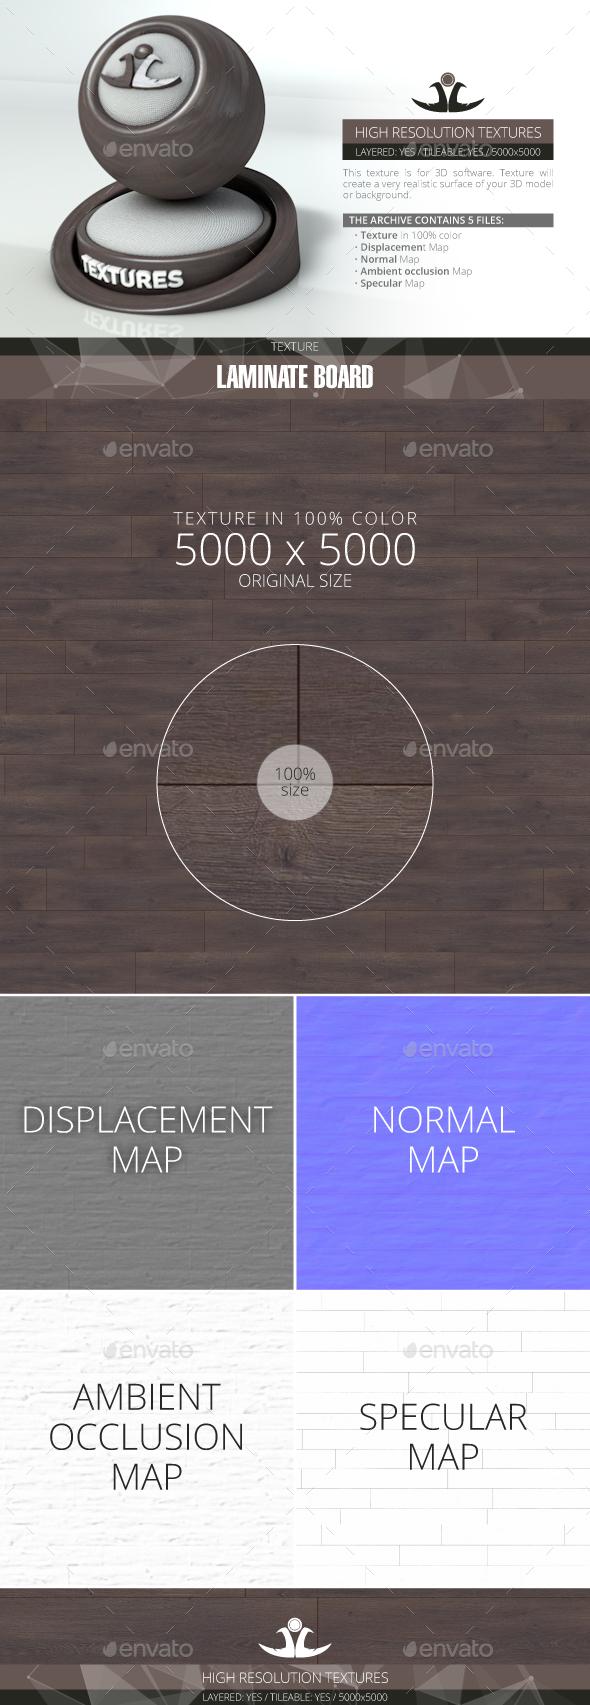 Laminate Board 41 - 3DOcean Item for Sale